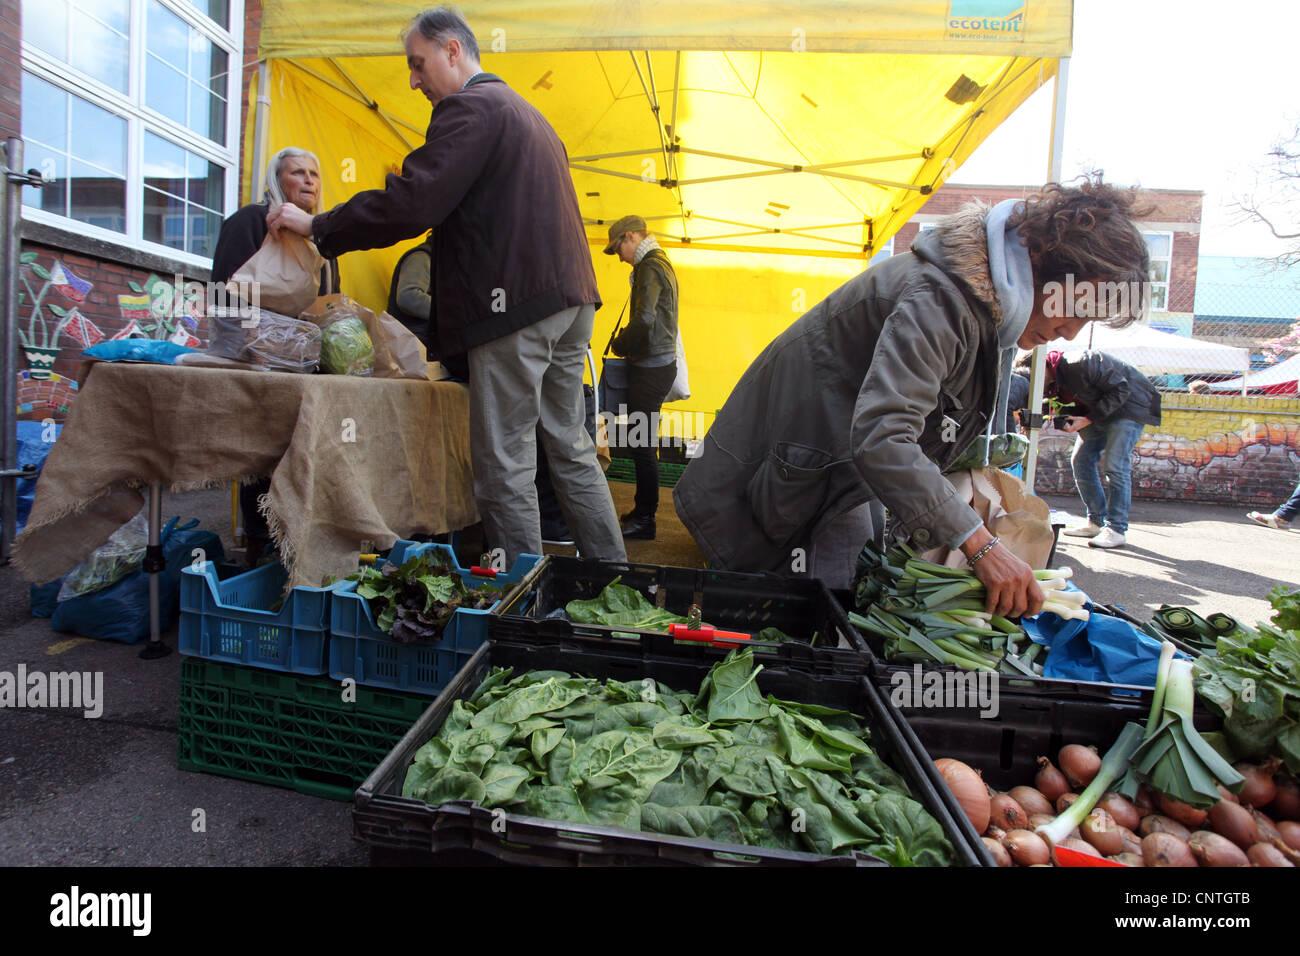 Queen's Park Farmers' Market - Stock Image